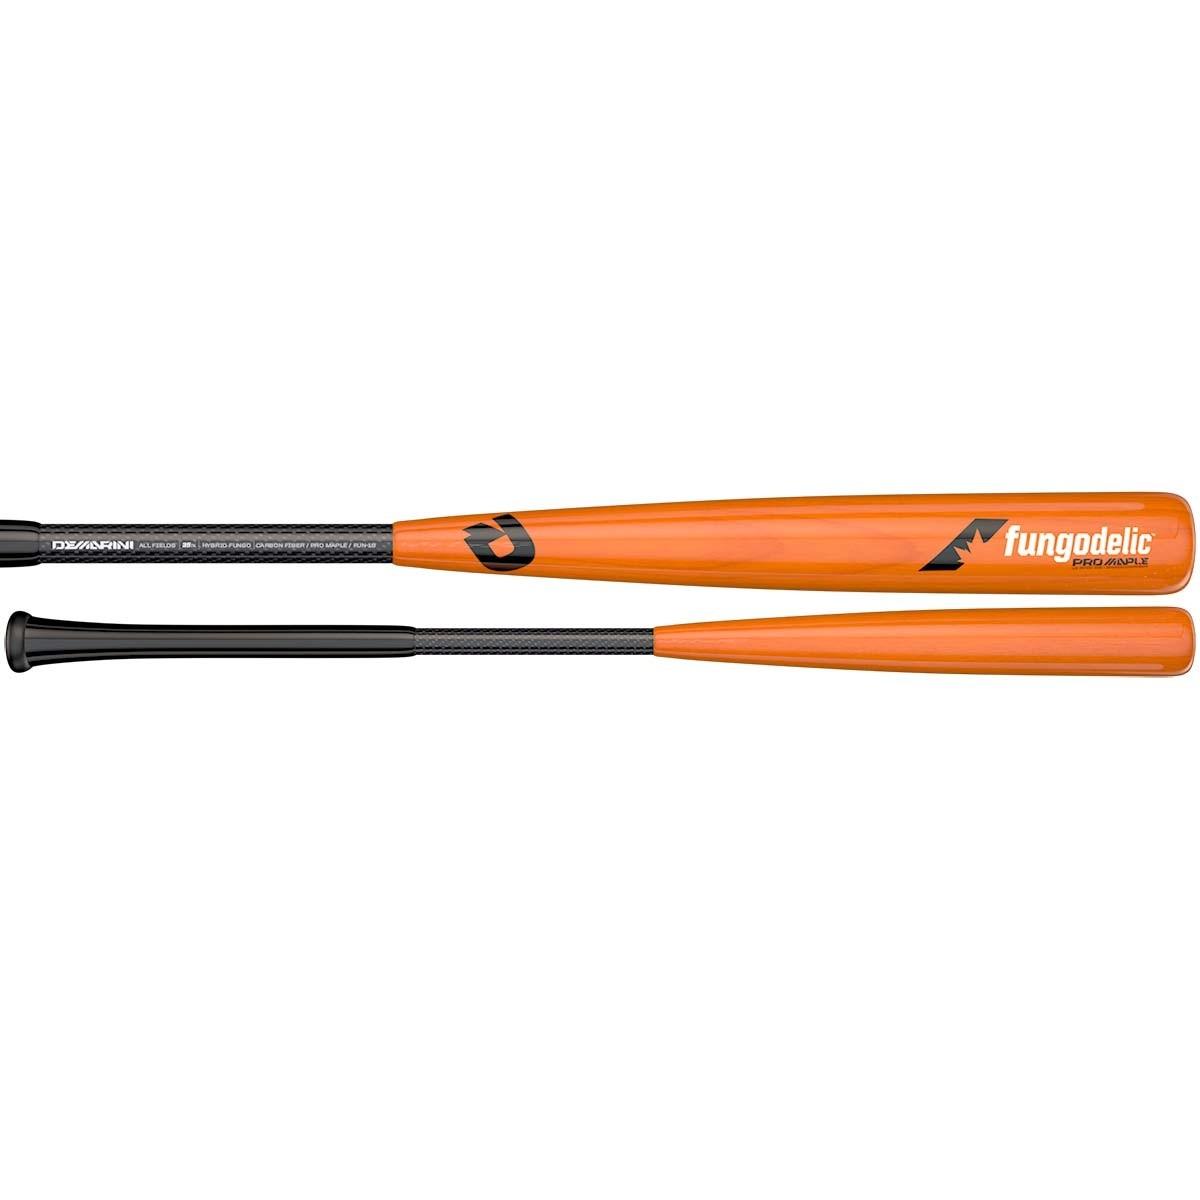 DeMarini Fungodelic Pro Maple Wood Composite Fungo Bat, WTDXFUNDE1835